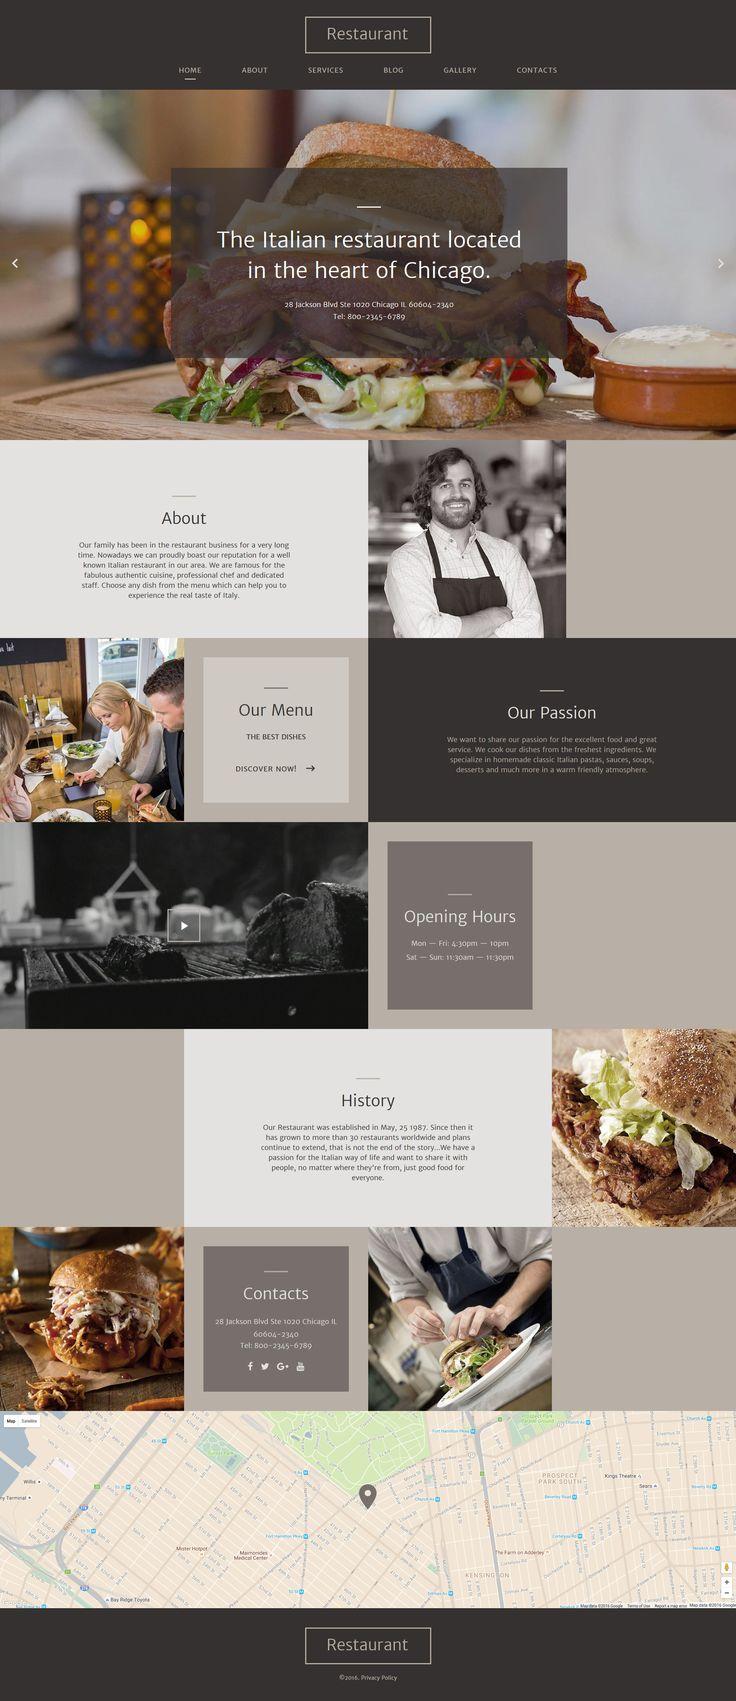 Italian Restaurant Responsive Website Template - http://www.templatemonster.com/website-templates/italian-restaurant-responsive-website-template-58062.html